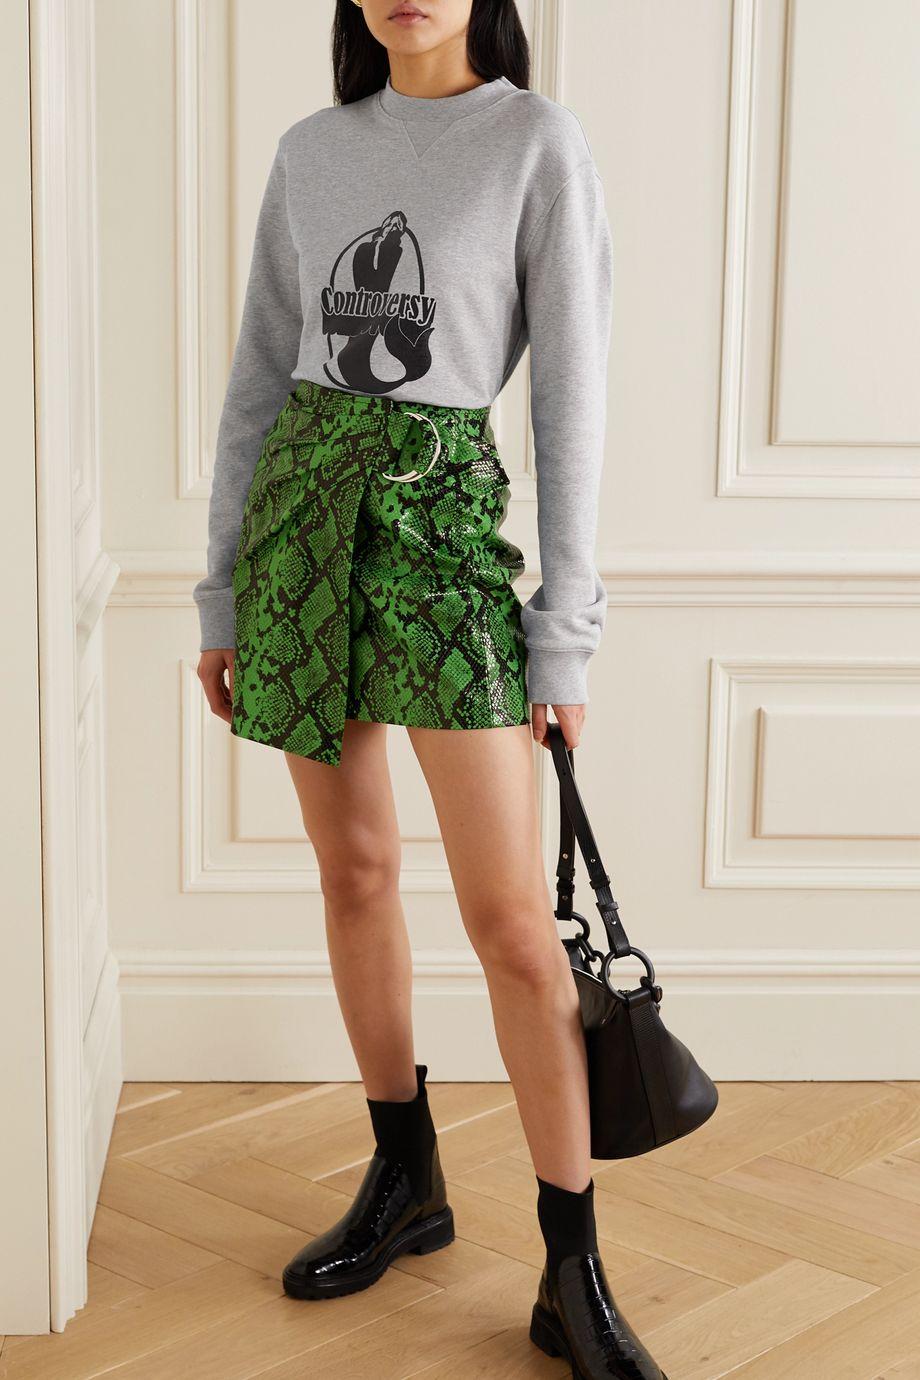 BLOUSE Controversy printed organic cotton-jersey sweatshirt